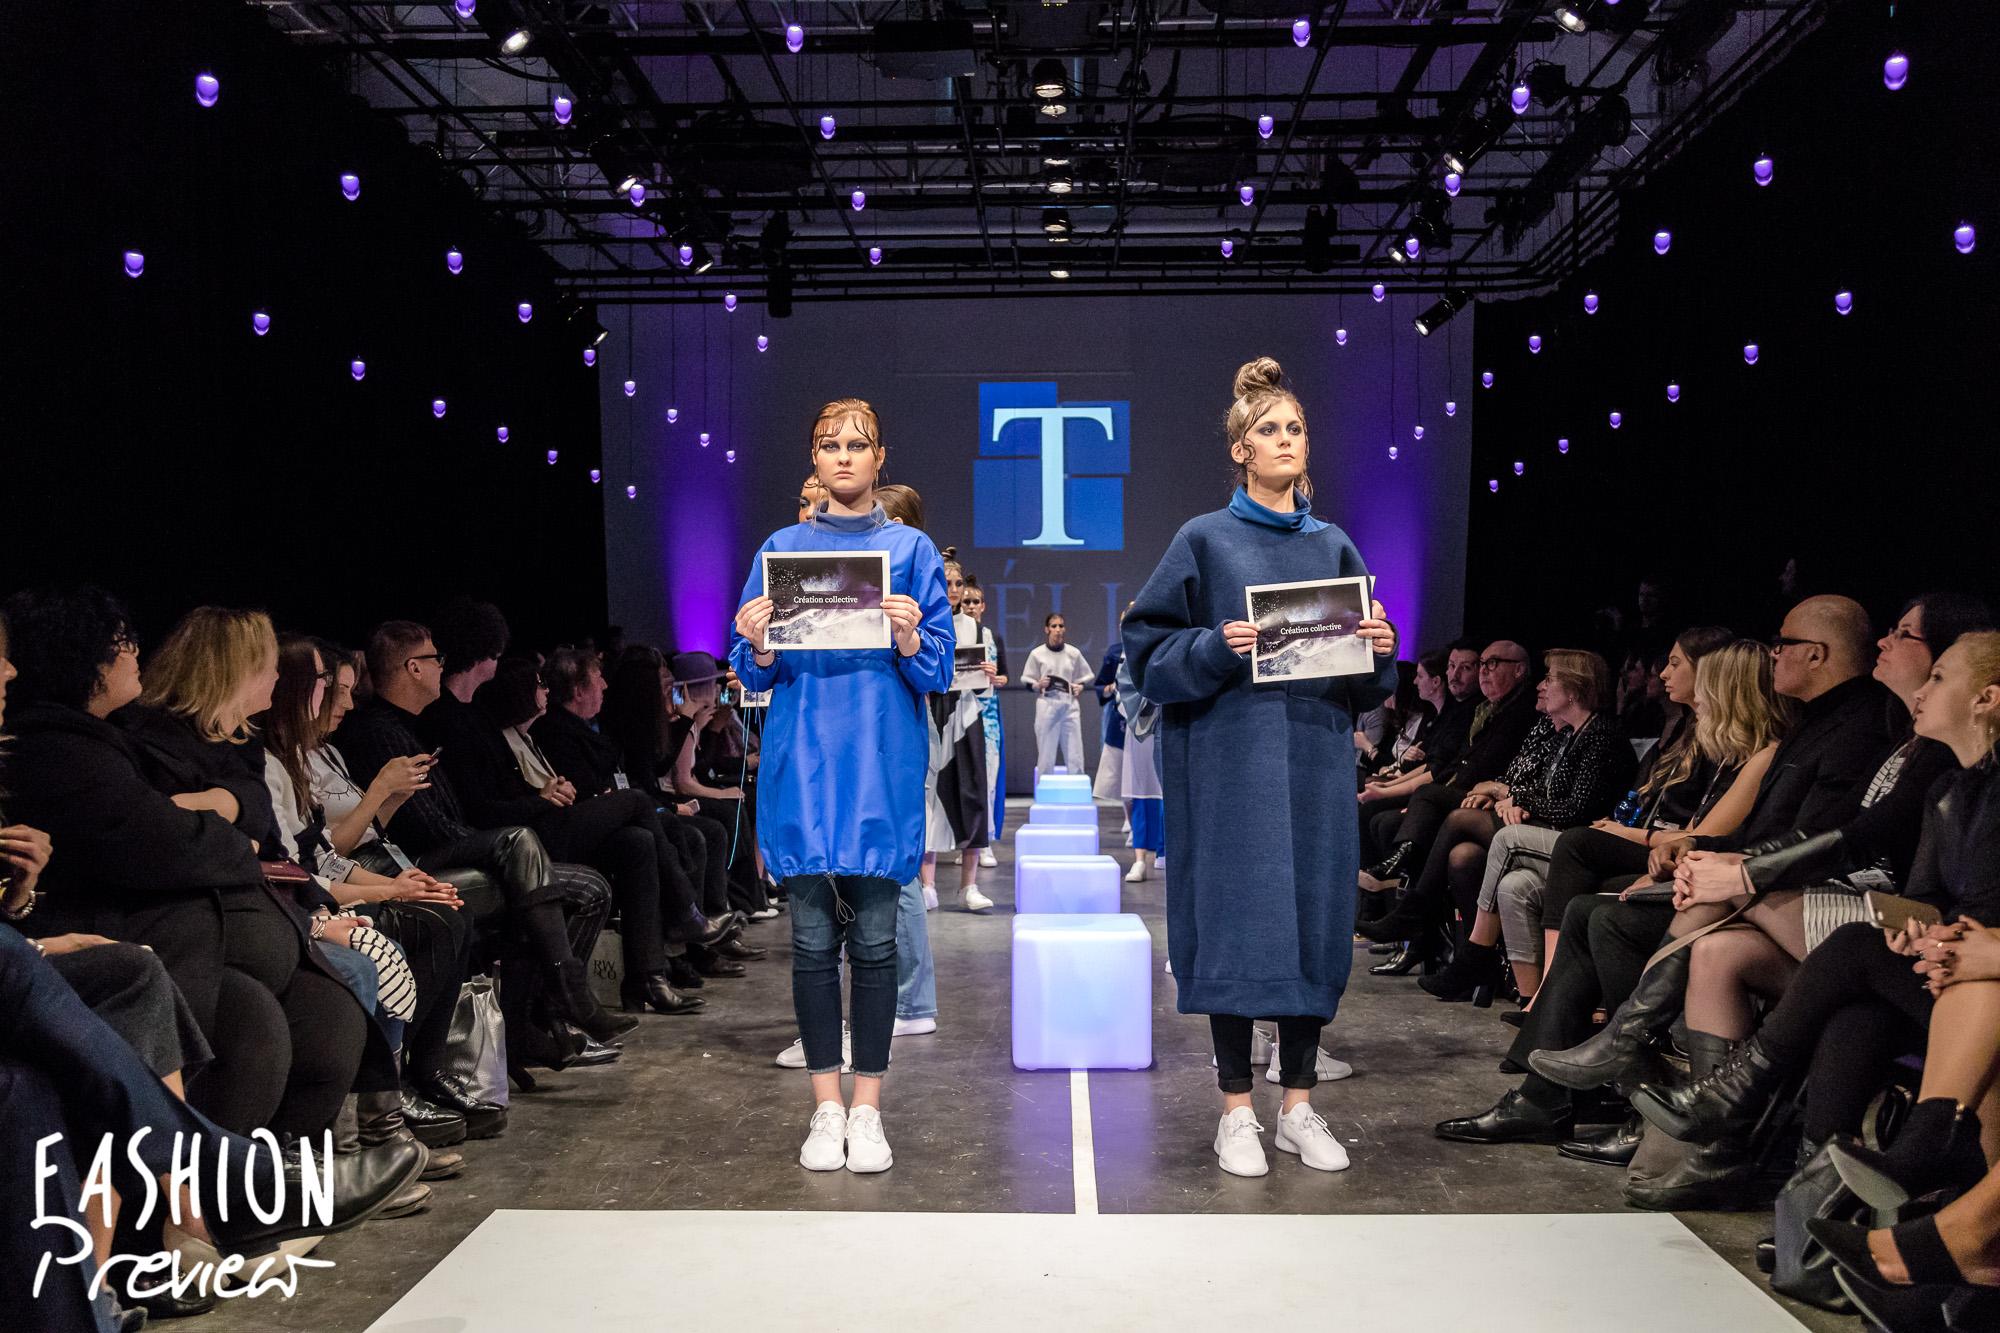 Fashion Preview 9 - Cegep Marie Victorin-28.jpg